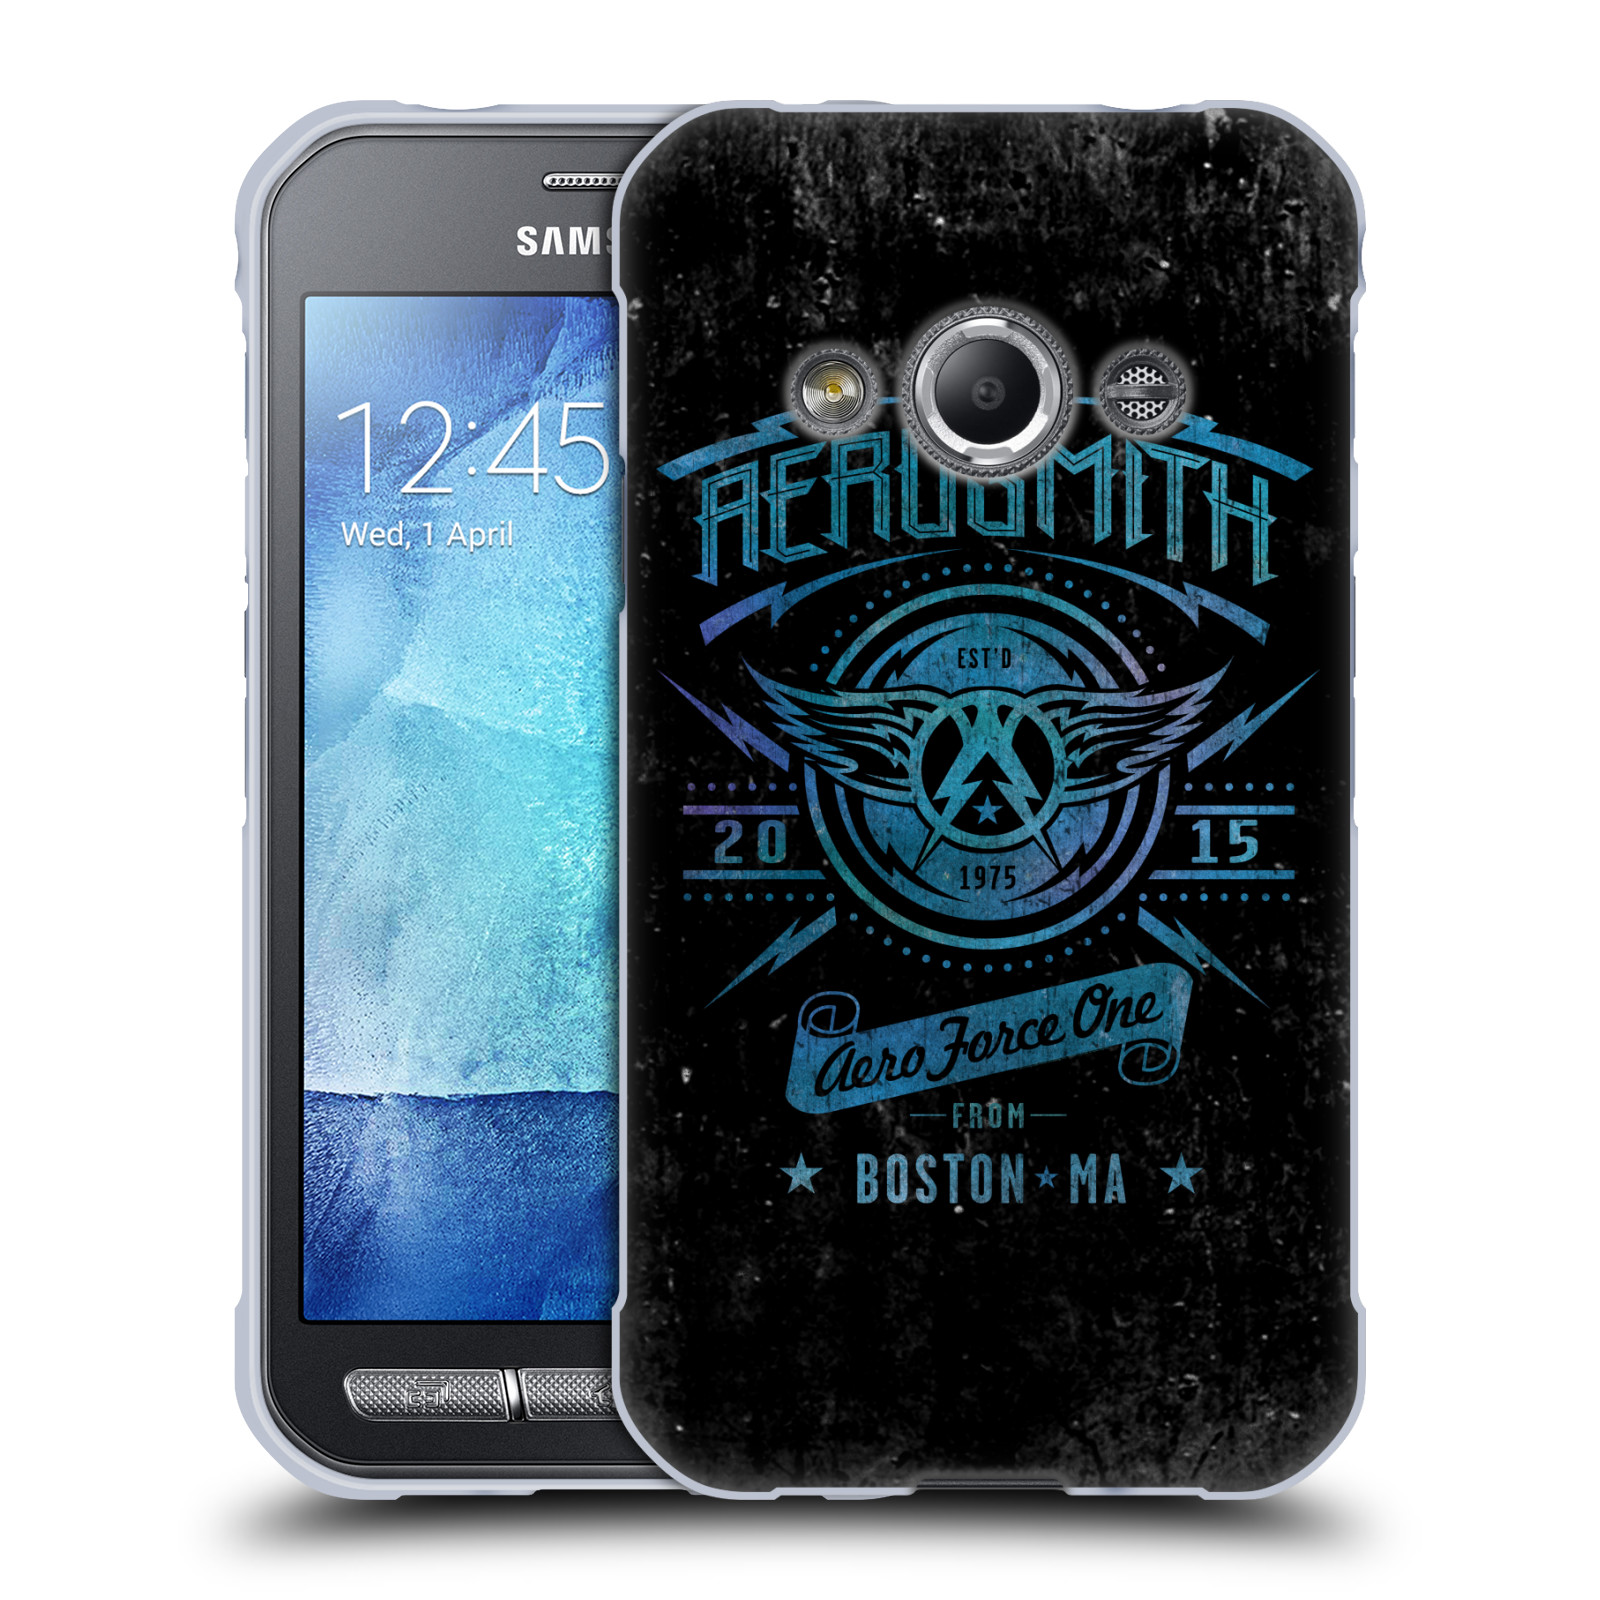 Silikonové pouzdro na mobil Samsung Galaxy Xcover 3 HEAD CASE - Aerosmith - Aero Force One